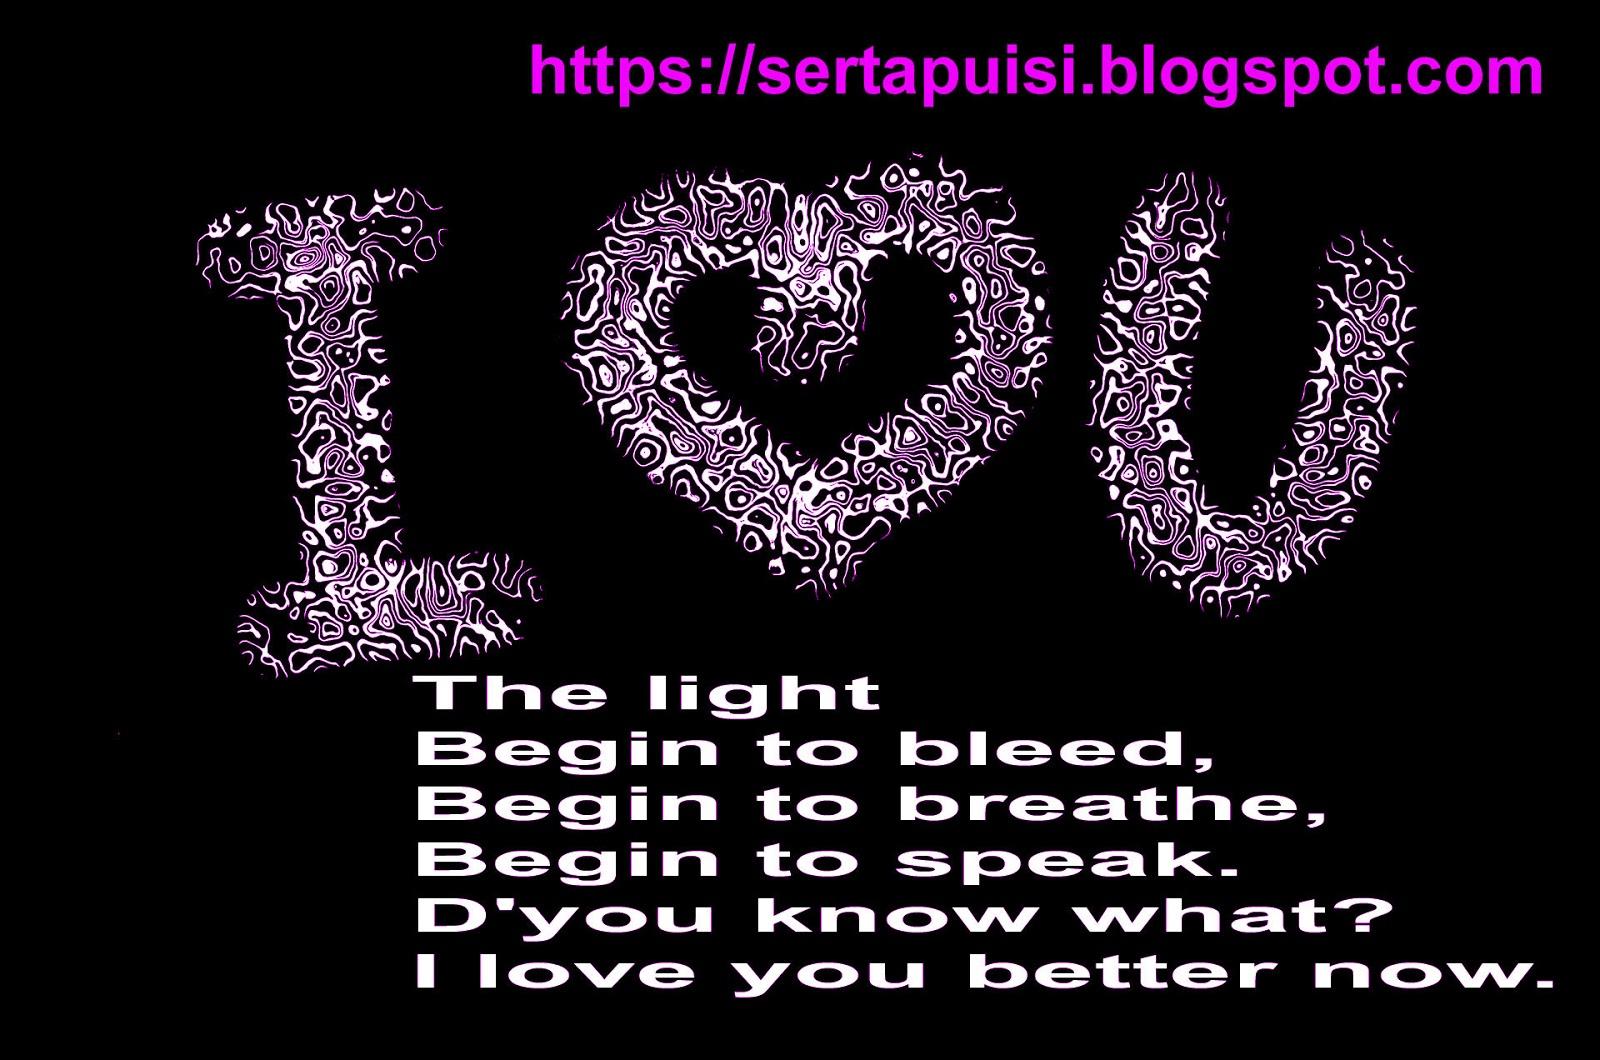 Kata Kata Cinta Galau Paling Menyentuh Buat Pacar Serta Untuk Mantan